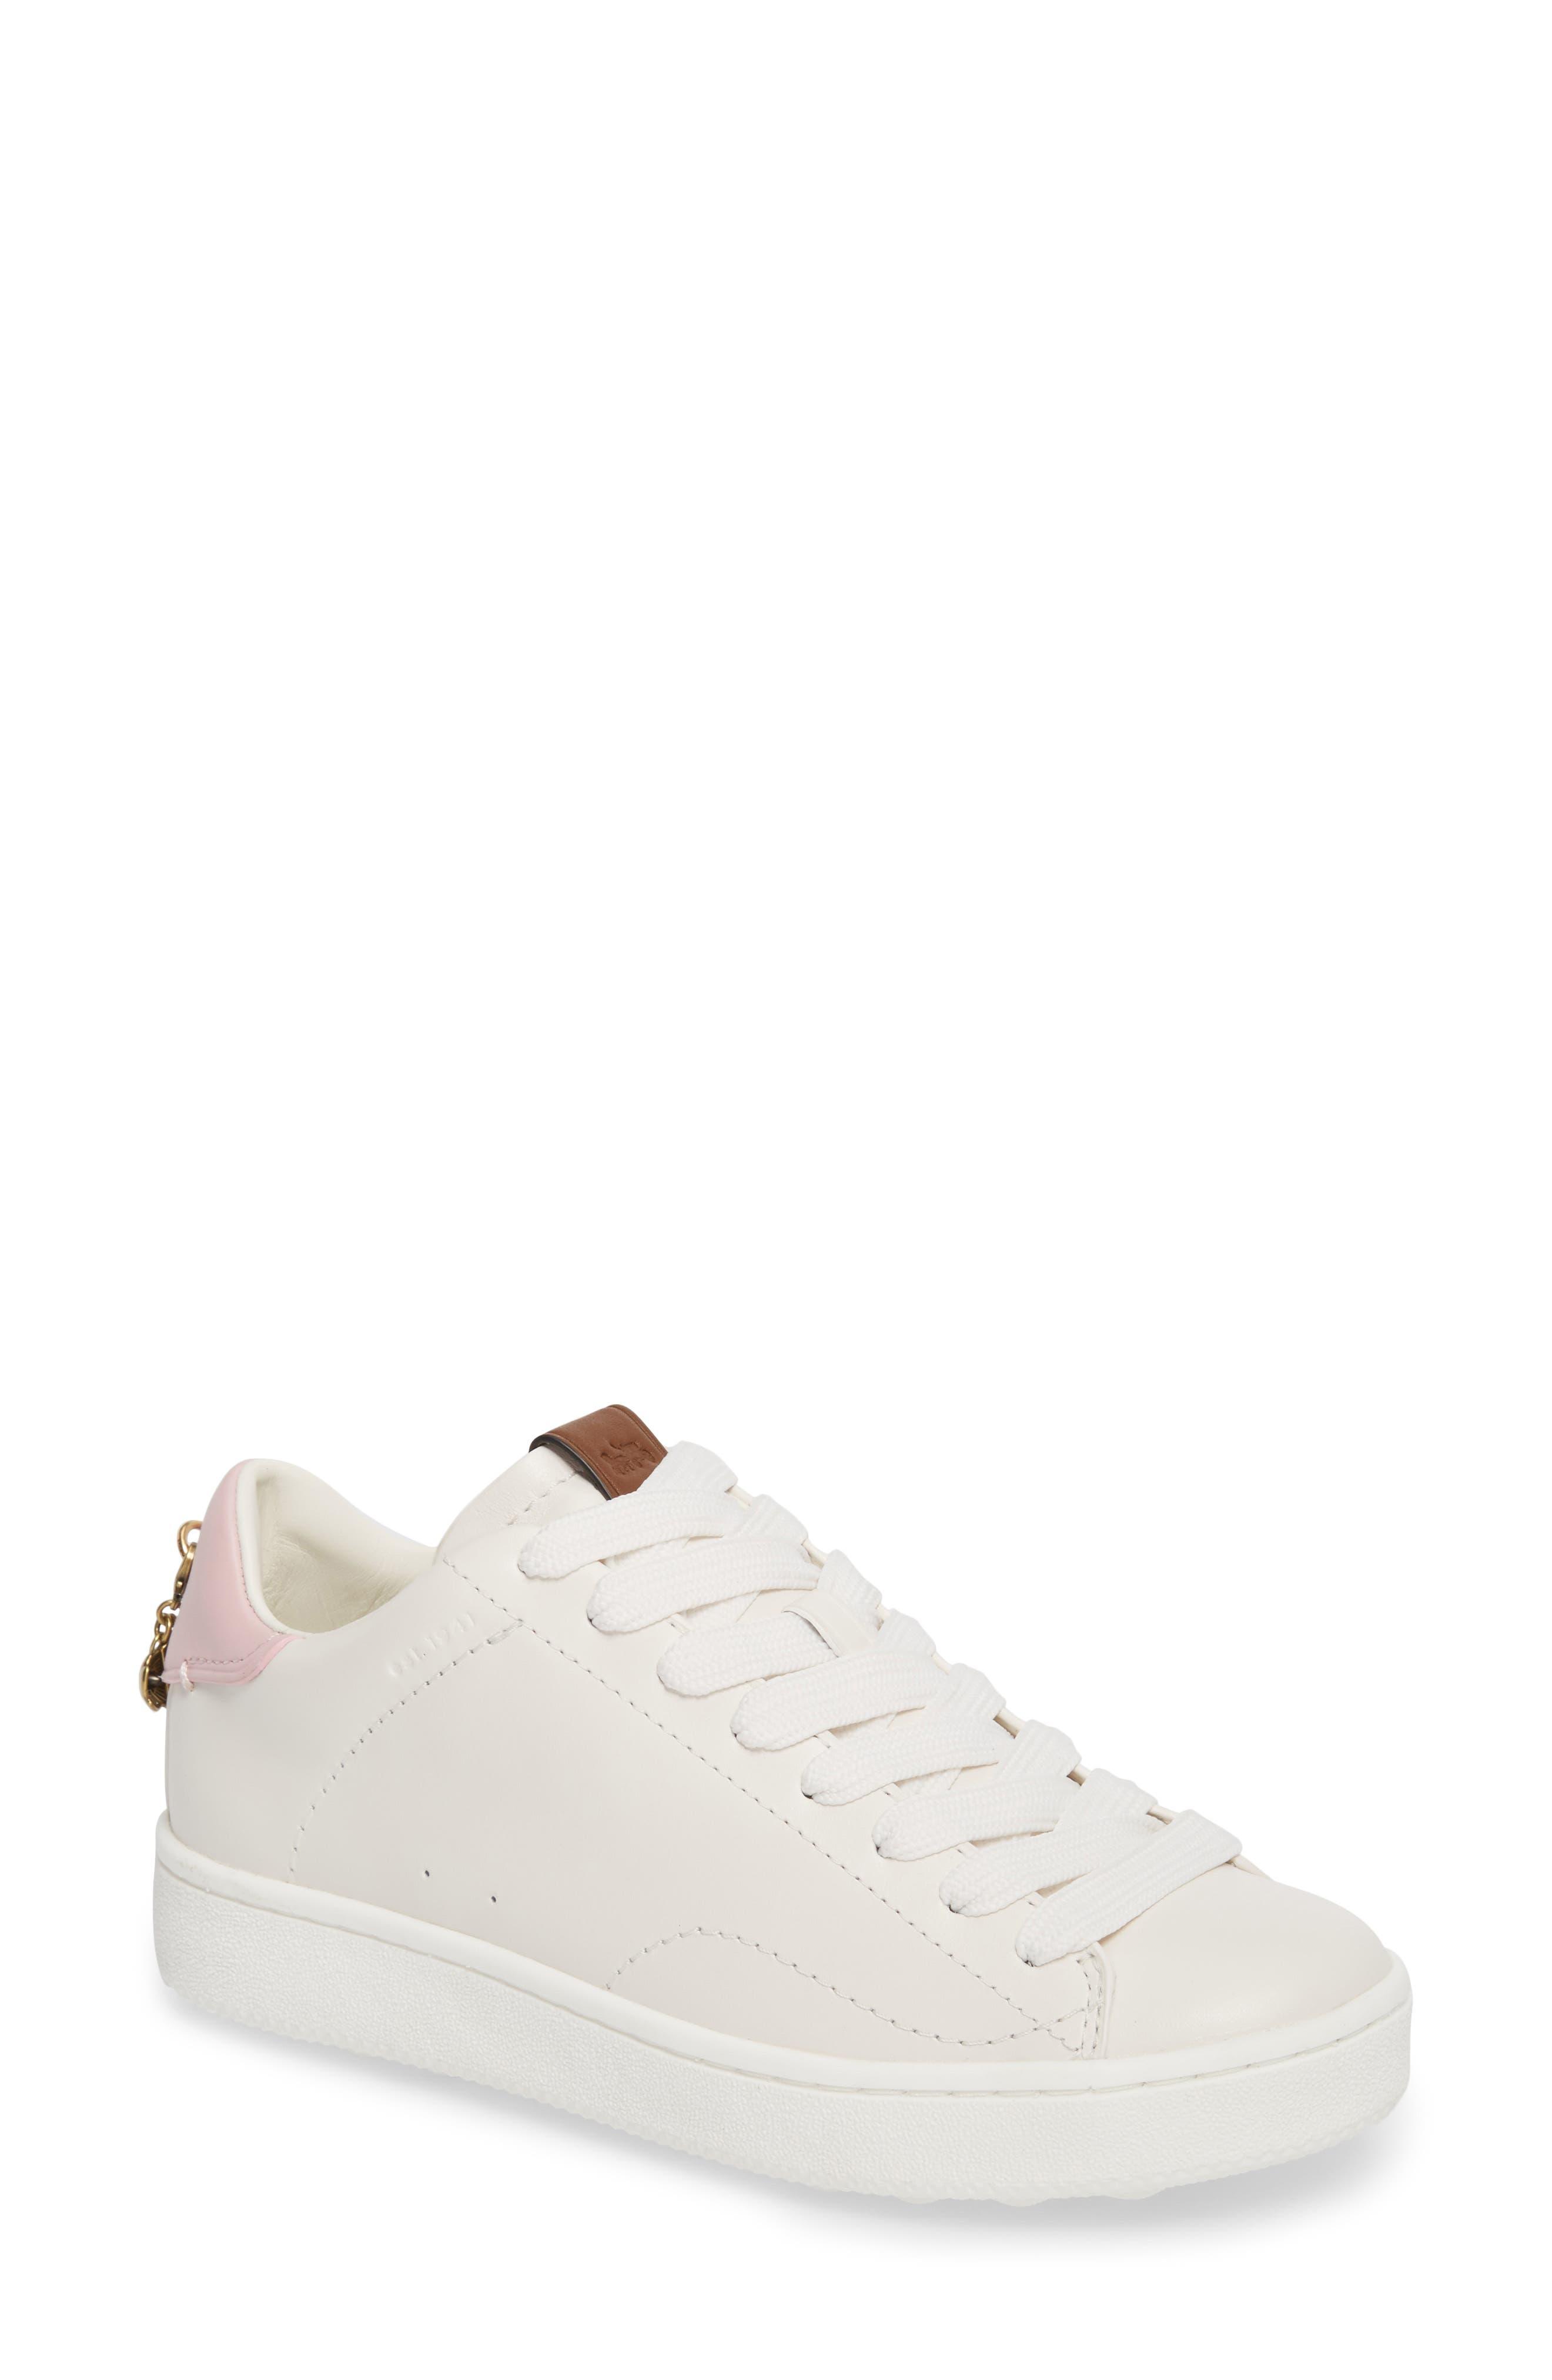 COACH Sneaker, Main, color, WHITE/ PETAL LEATHER